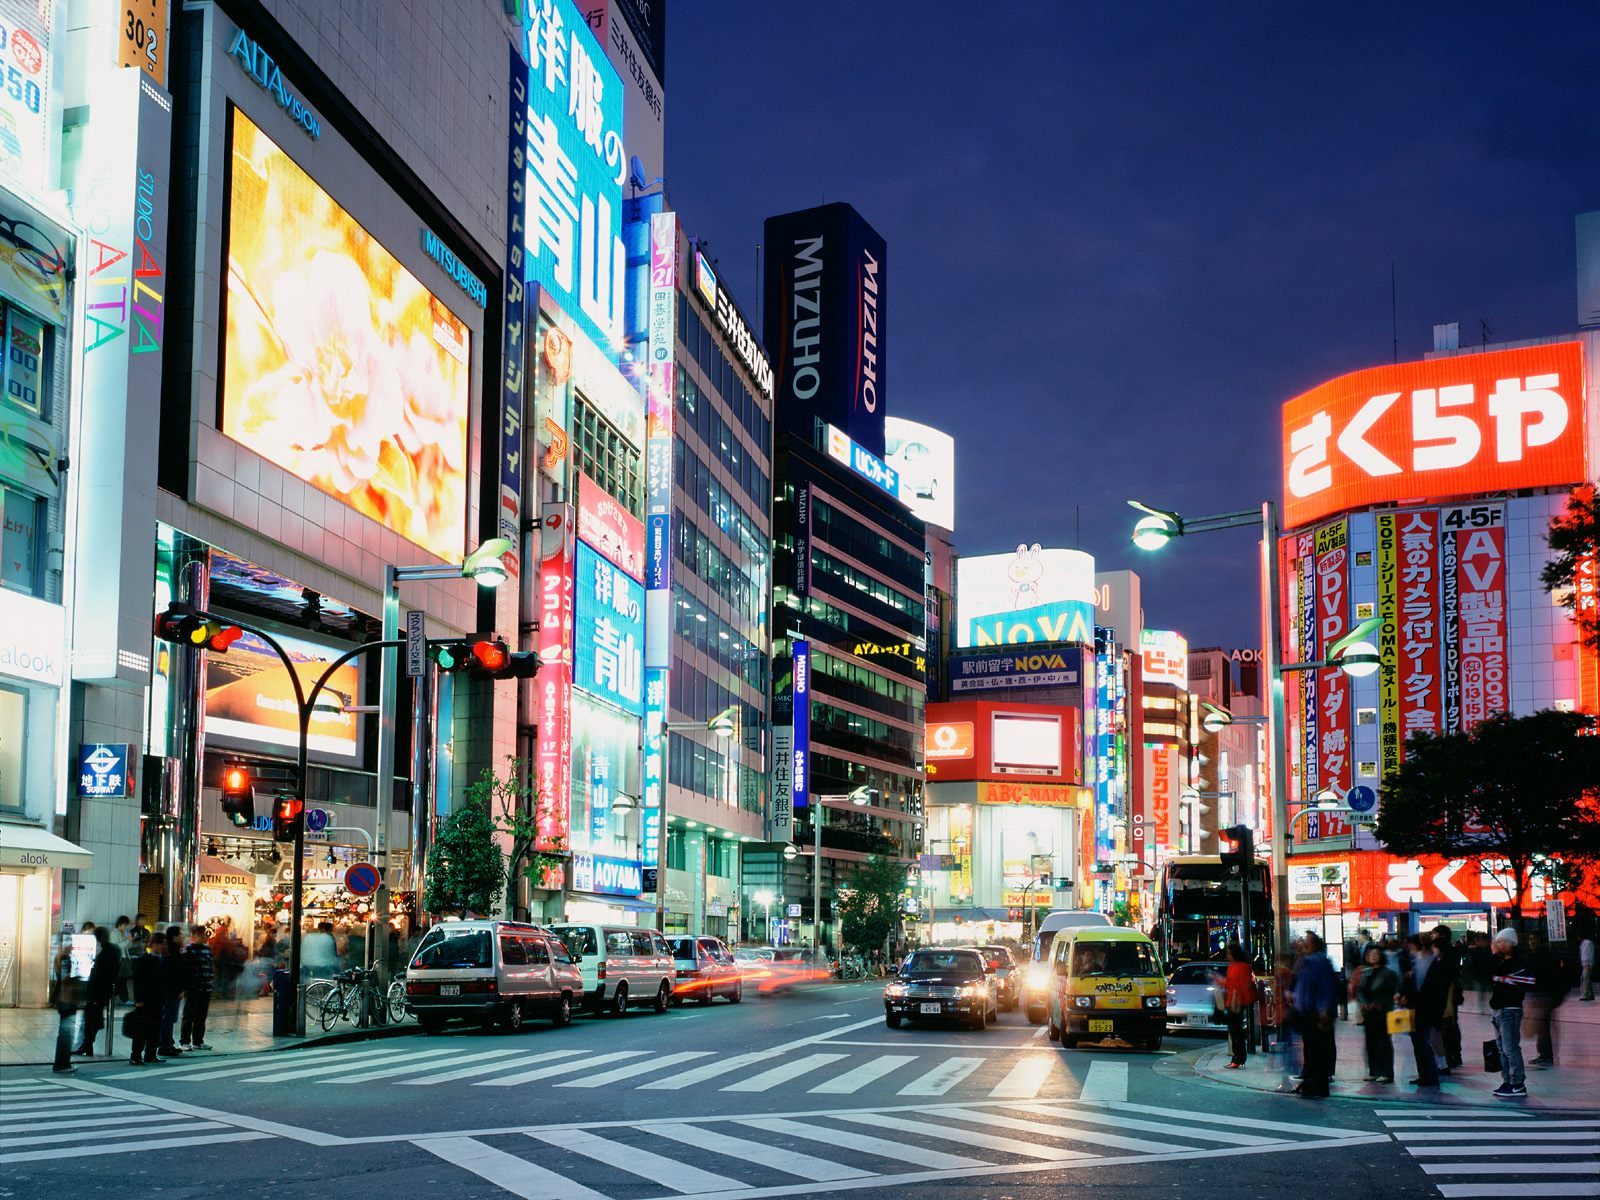 Tower Records Shinjuku Anime Song Chart March 18-24